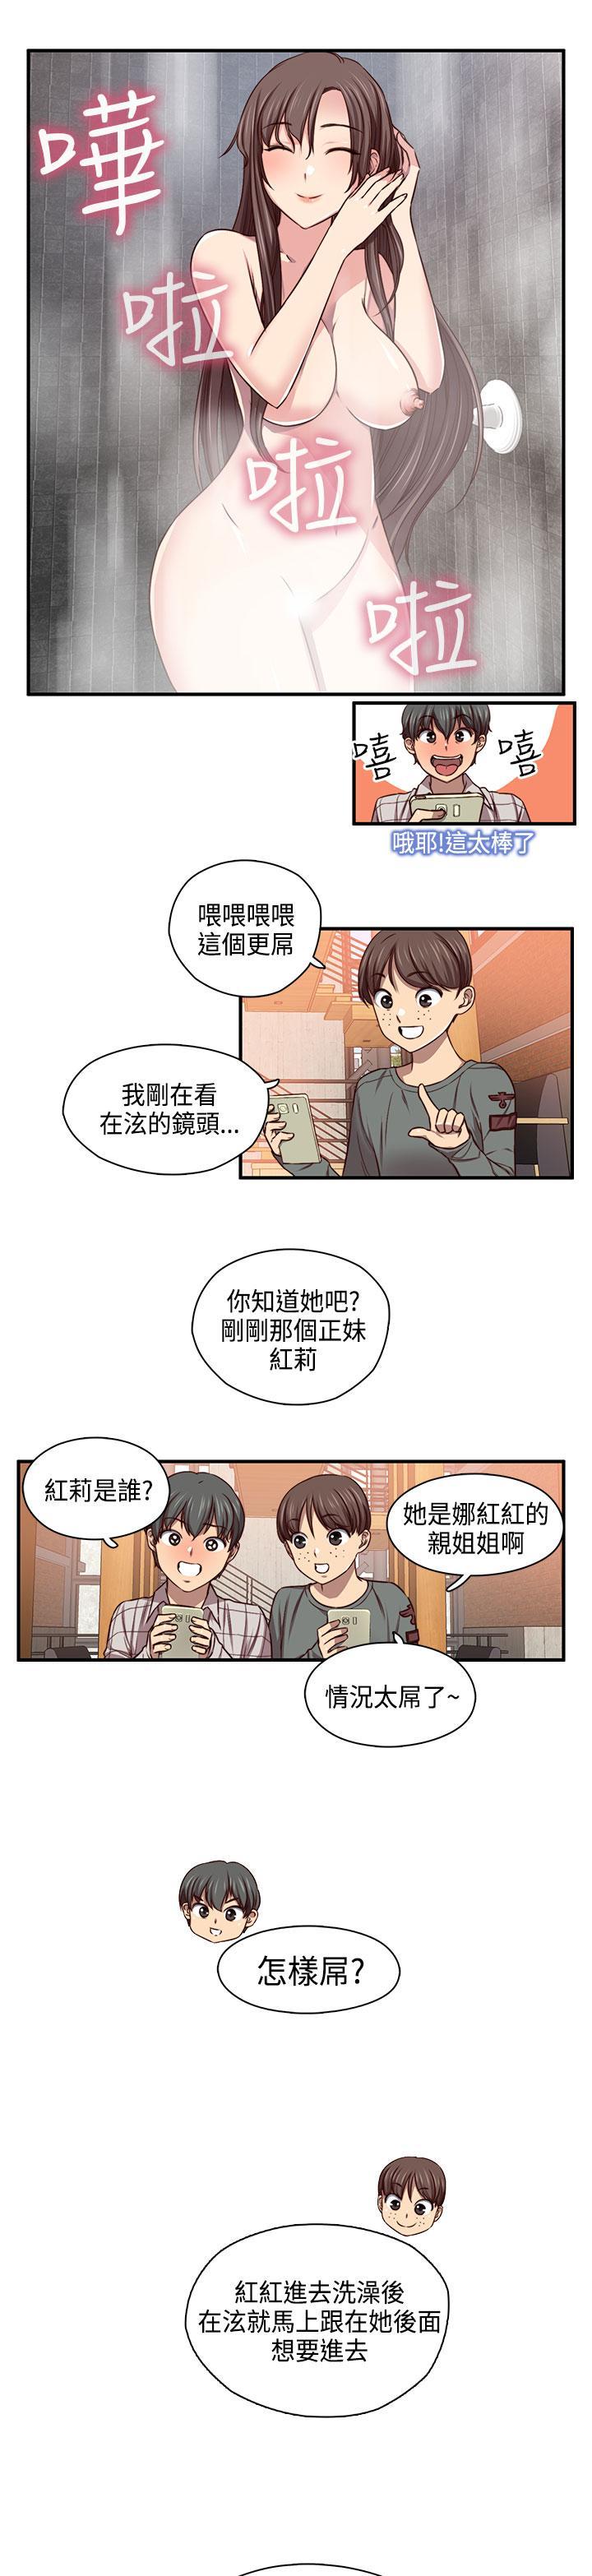 [Dasum & Puutaro] H-Campus H校园<第2季> ch.41-46 (chinese) 156